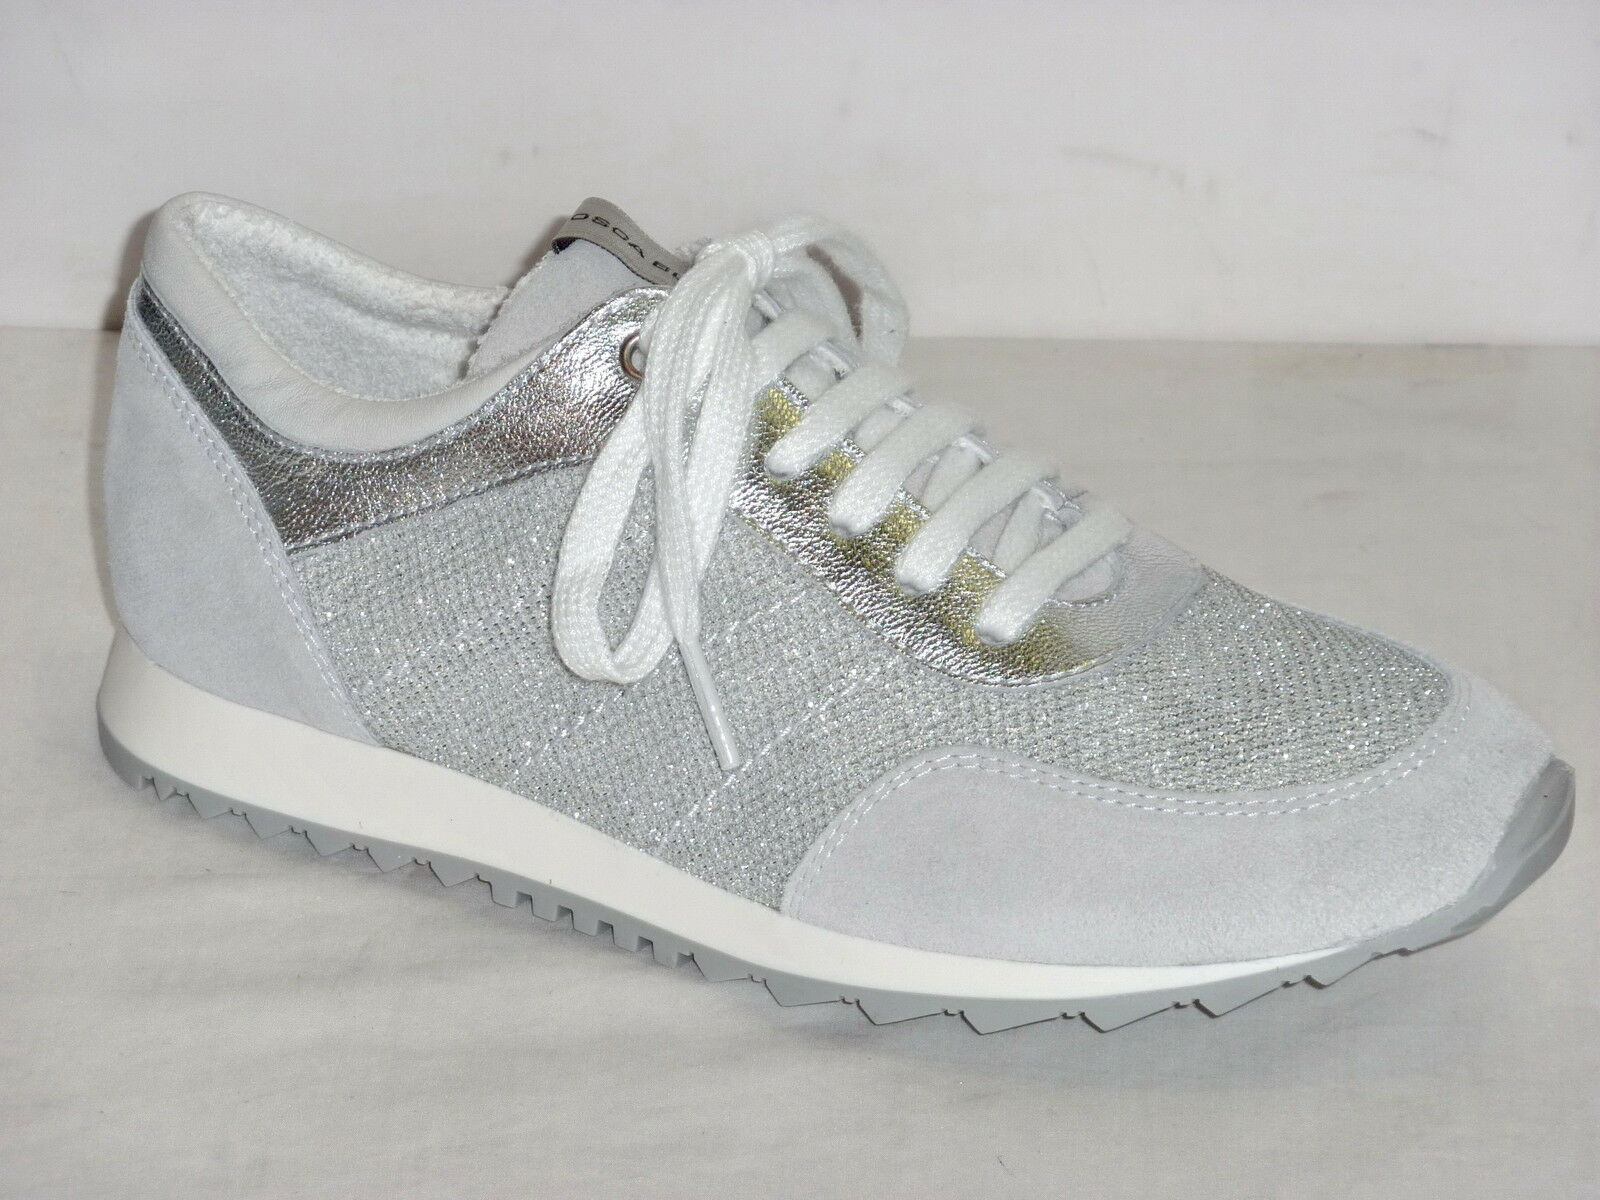 TOSCA blue shoes TENNIS SNEAKERS women PELLE NABUK GHIACCIO TESSUTO silver n.41